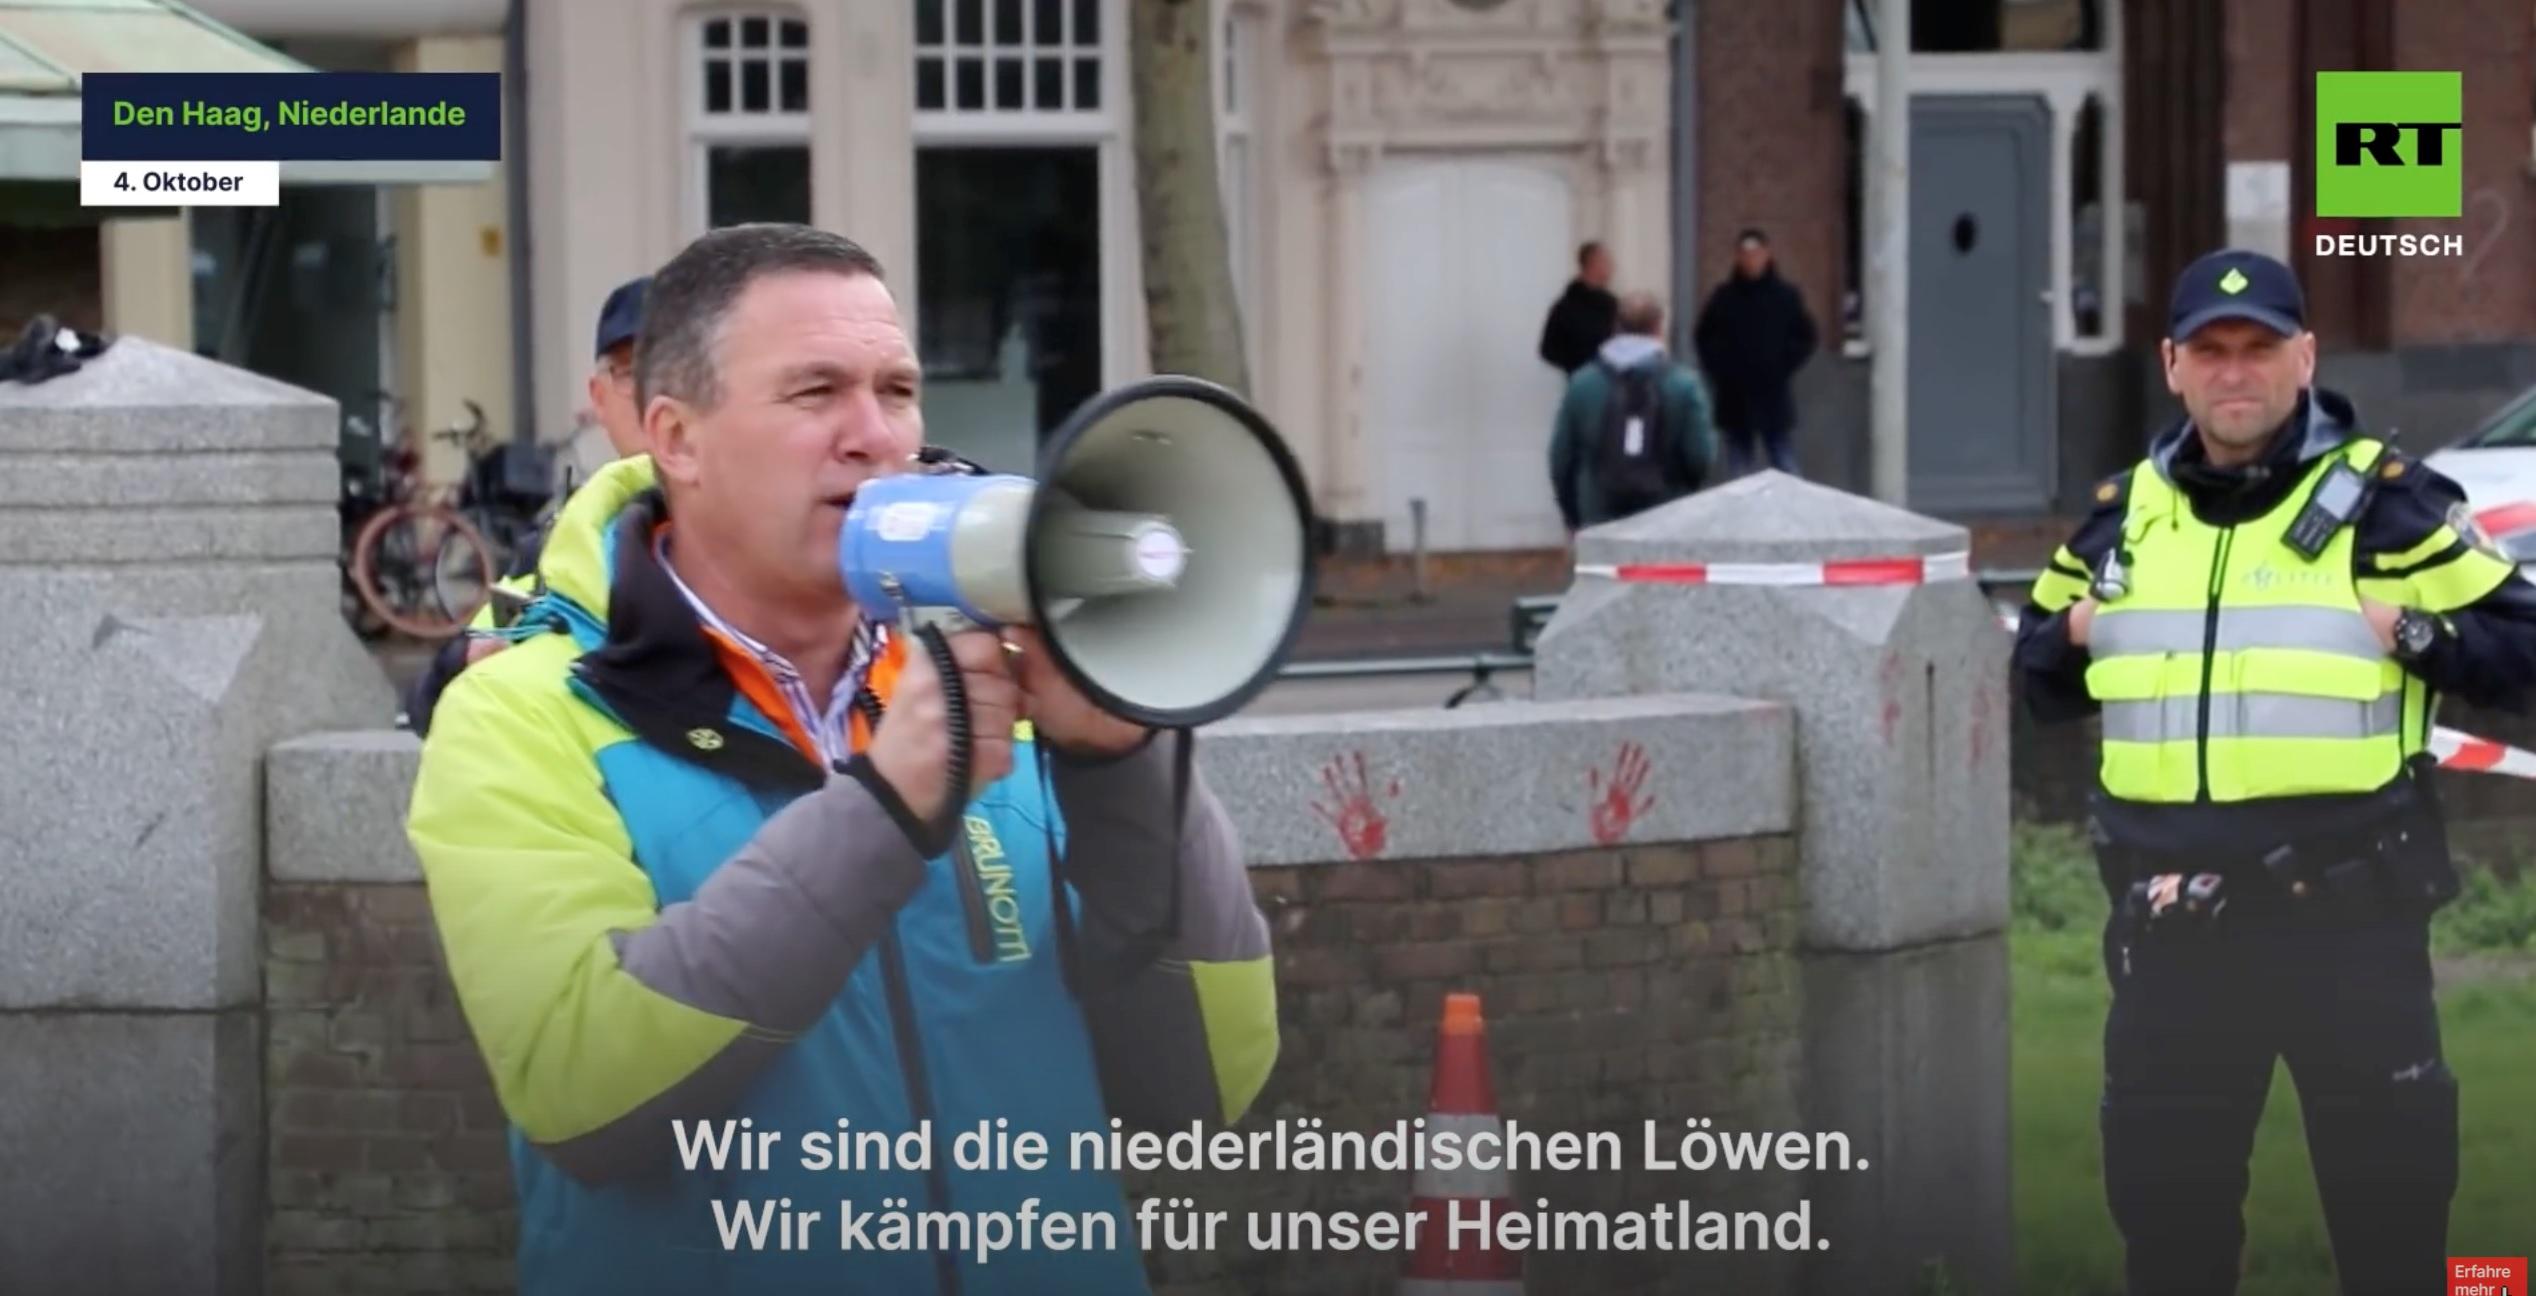 Russian Television (RT) Duitsland Was Bij Onze Demonstratie Van 4 Oktober In Den Haag Met Als Thema White Lives Matter, All Lives Matter, Vrijheid Https://www.youtube.com/watch?v=89gI3uf5L9U&feature=youtu.be&fbclid=IwAR2rZiHAFNFsqtsRNgOGkqgRRaLczc_T-rUOJxDBYJt4jsILzyheZMZiy_I